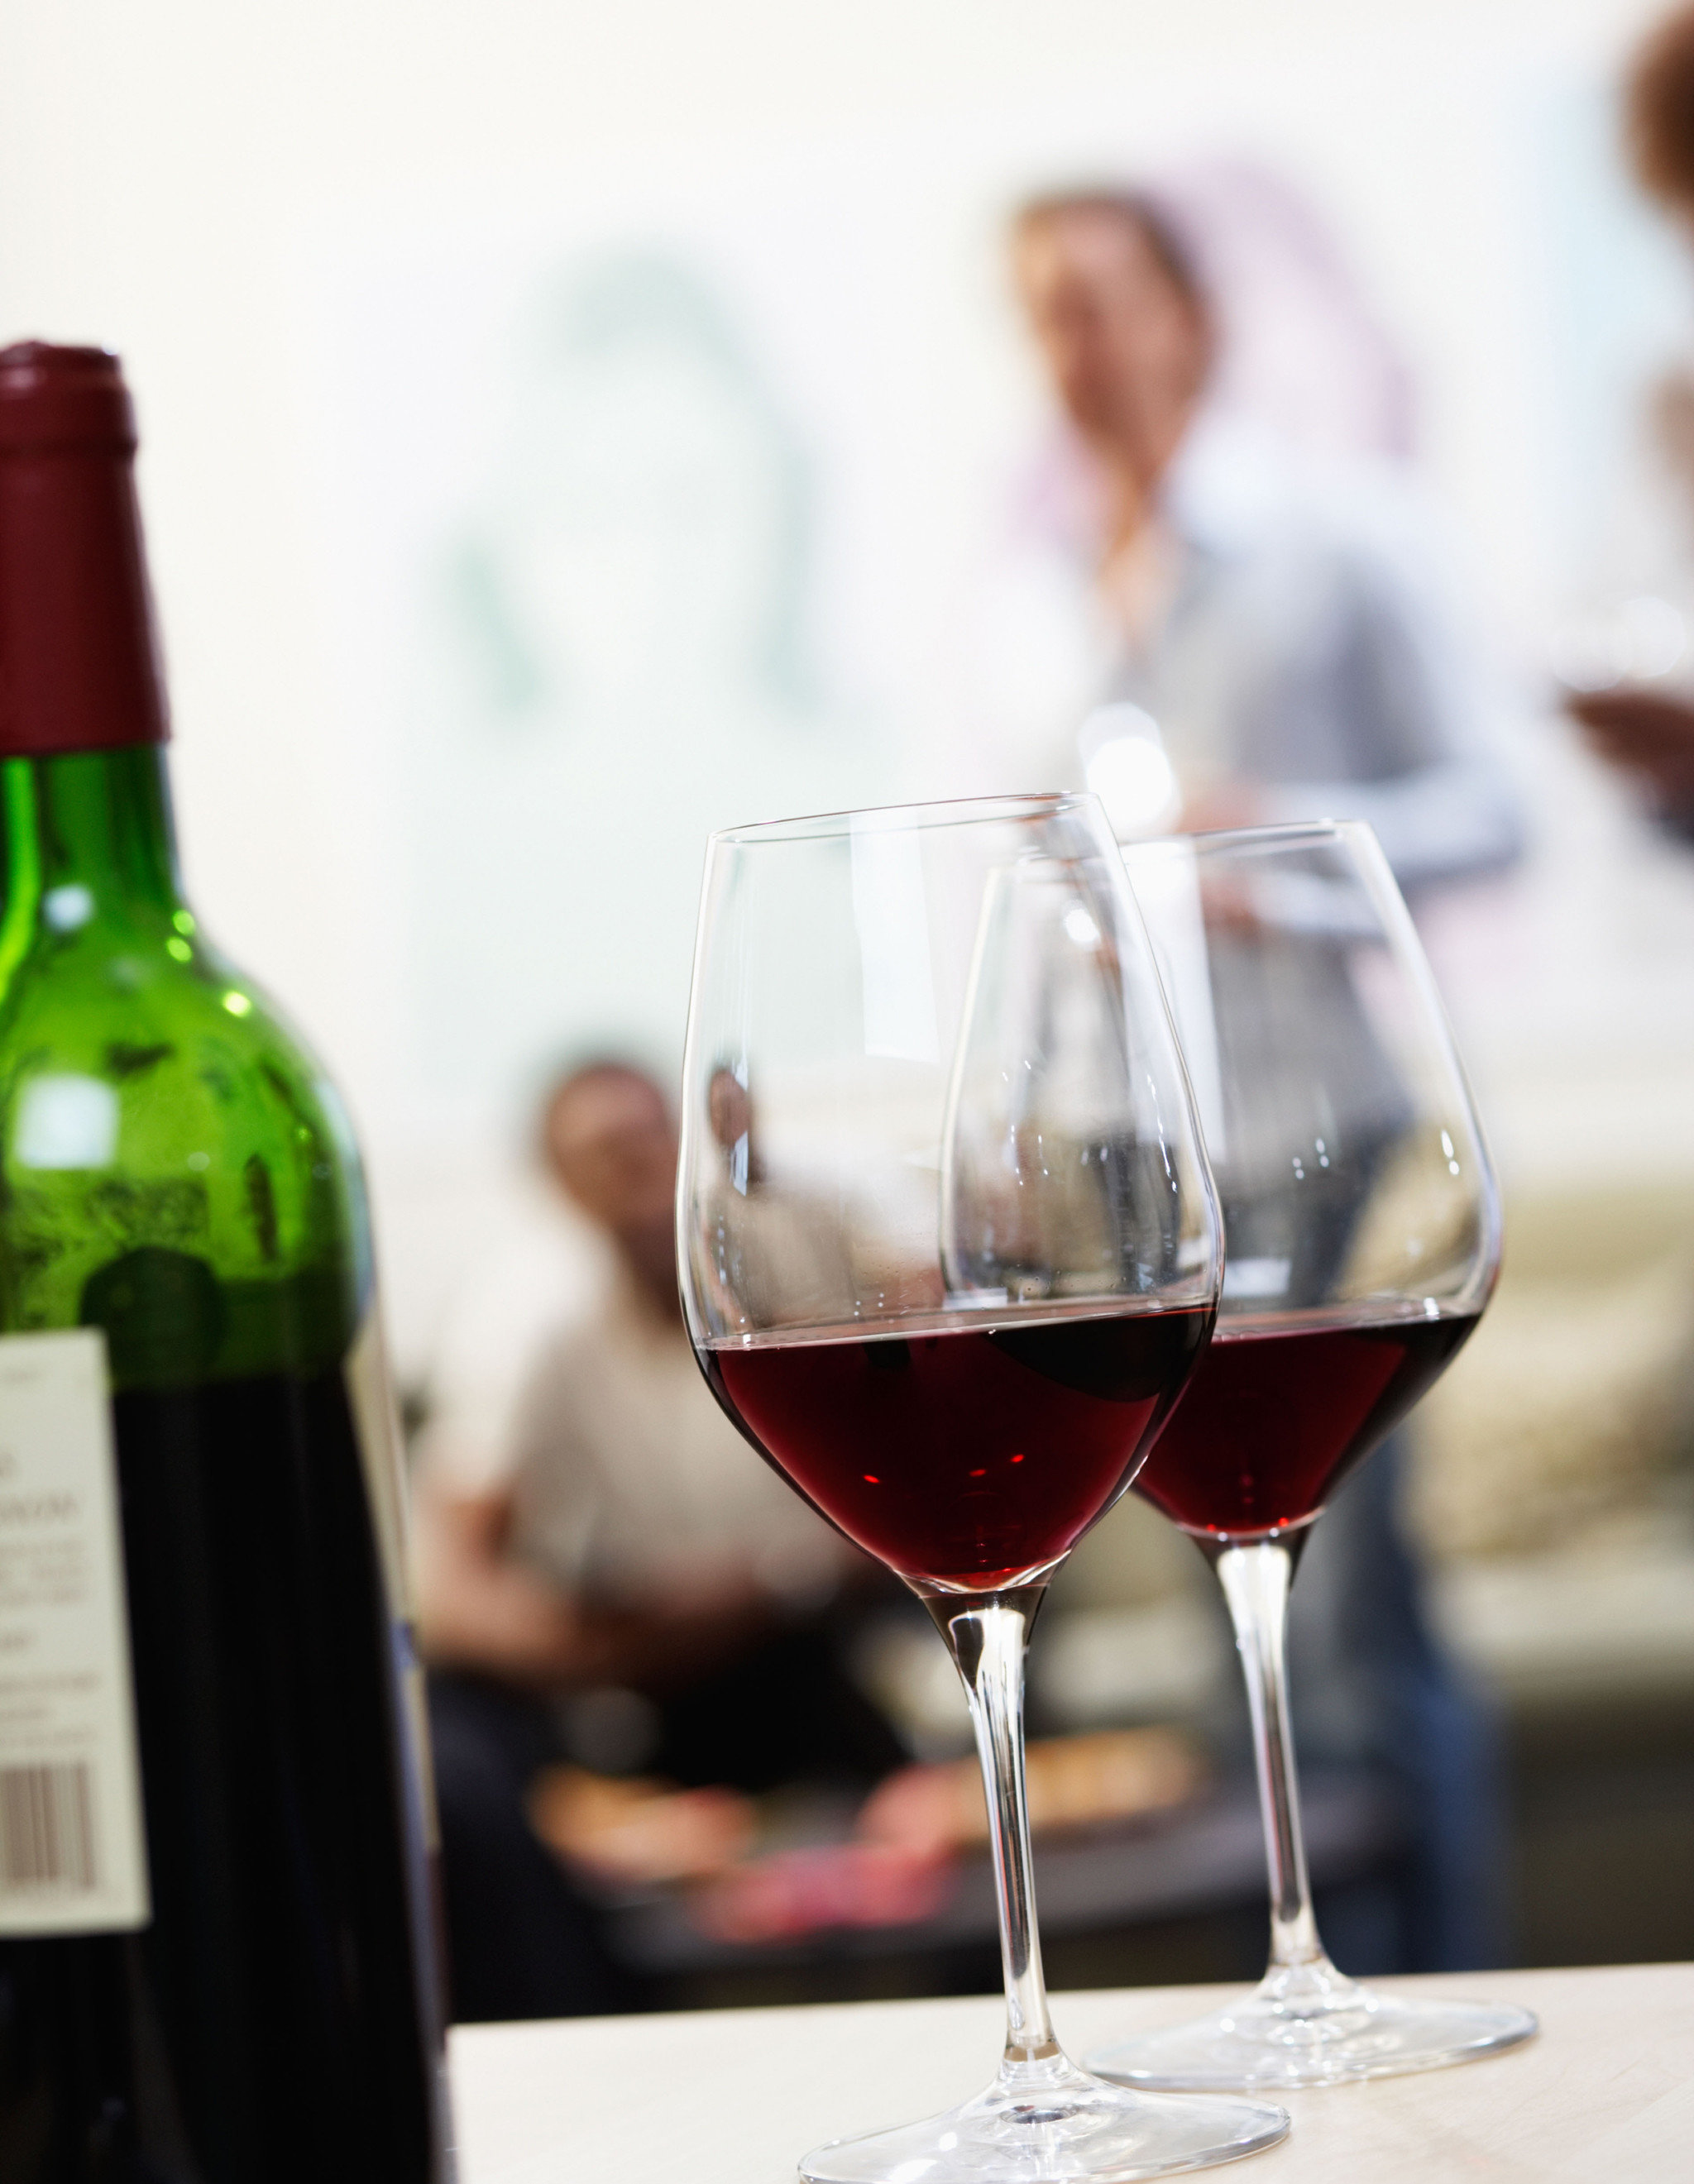 Elegant Historic Inn Romantic Wine-Tasting wine glass alcoholic beverage Drink wine glass red wine stemware wine bottle alcohol drinkware half beverage bottle sense material close